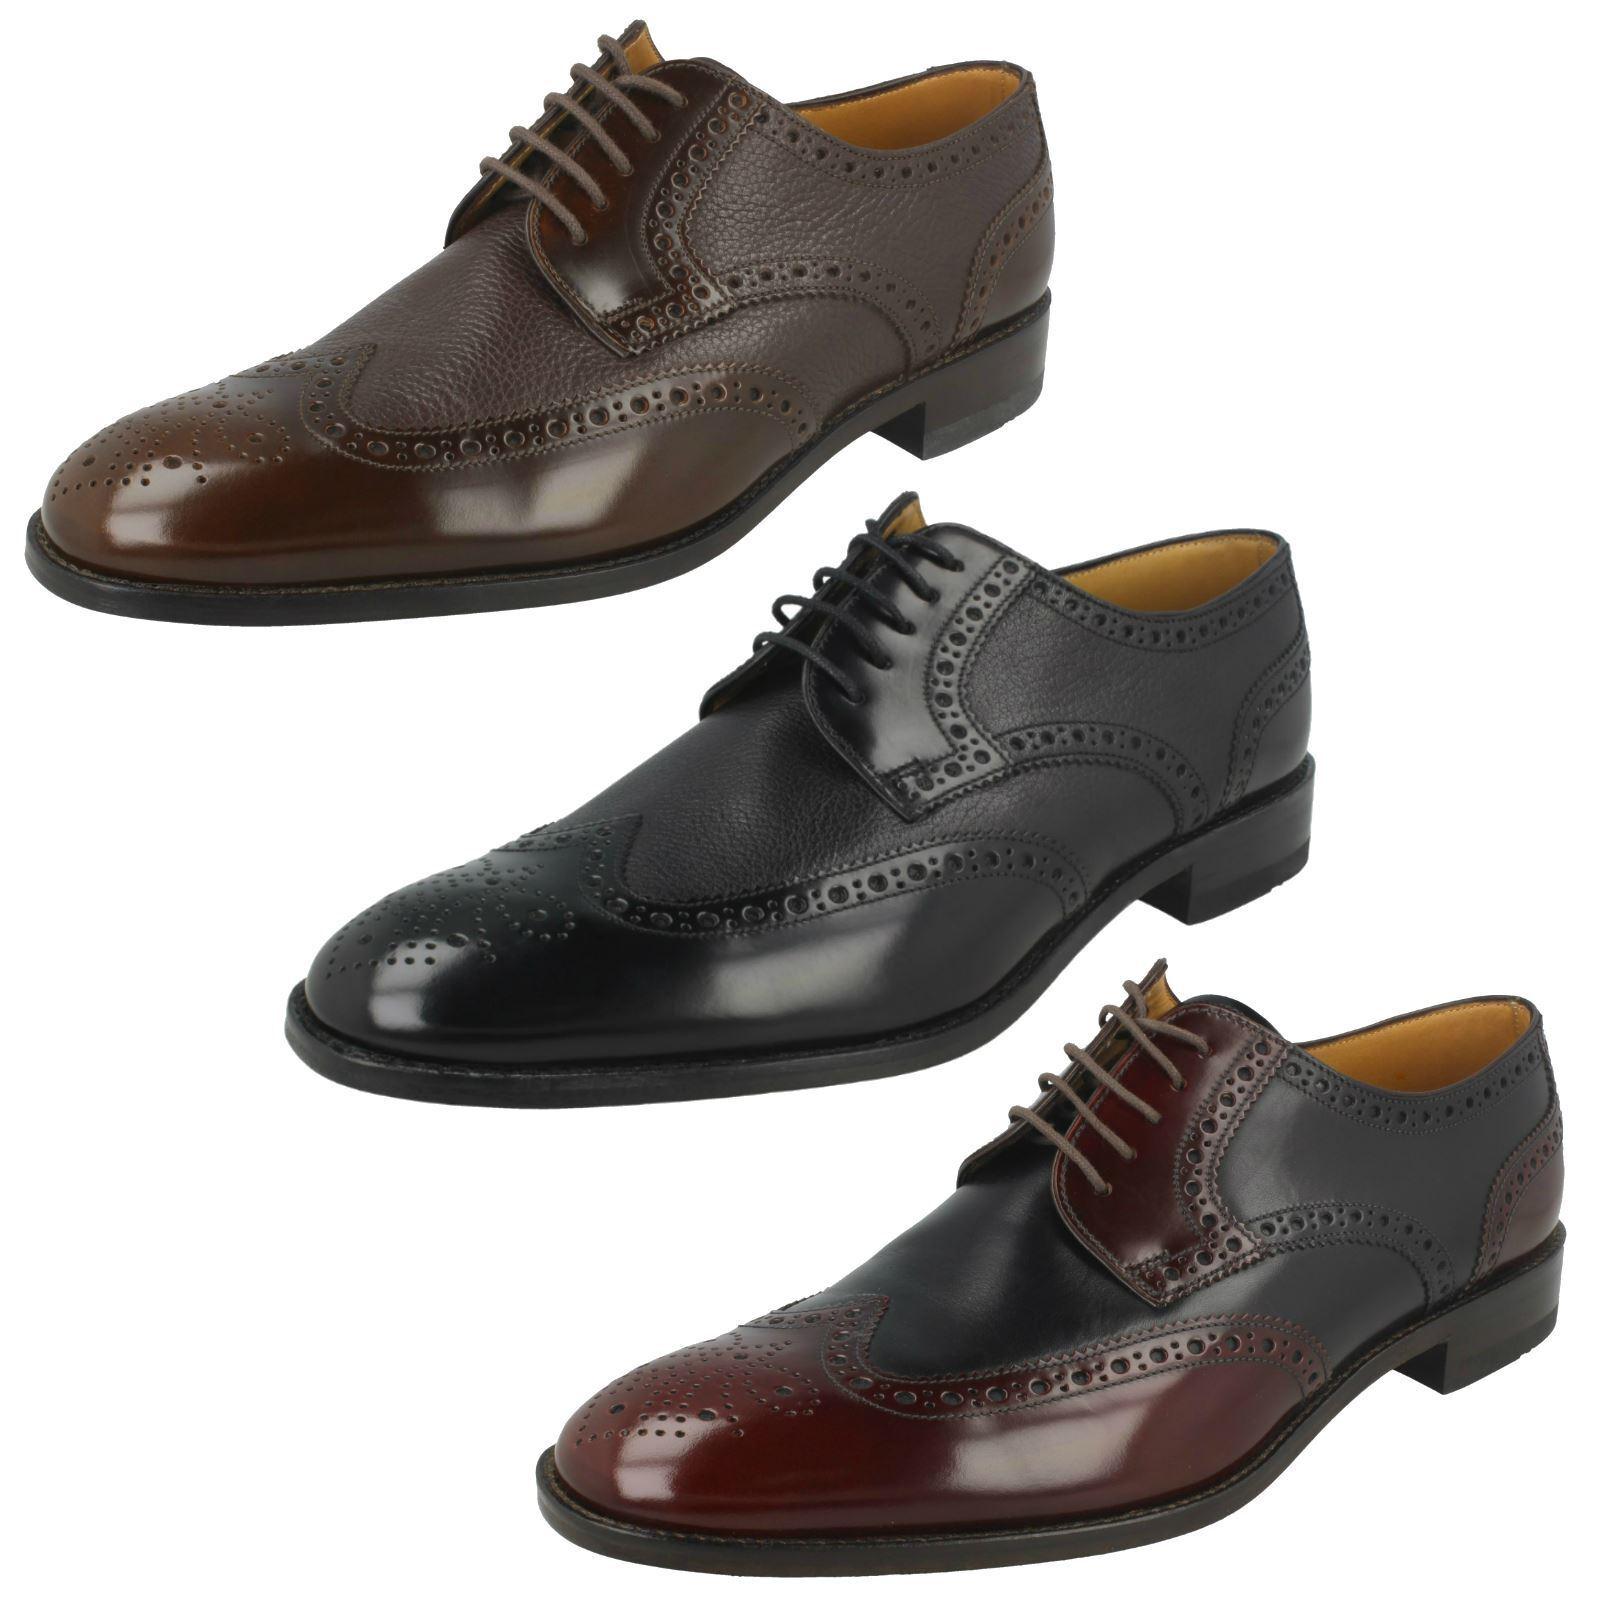 Billig gute Qualität Mens Loake Brogue Shoes Arlington